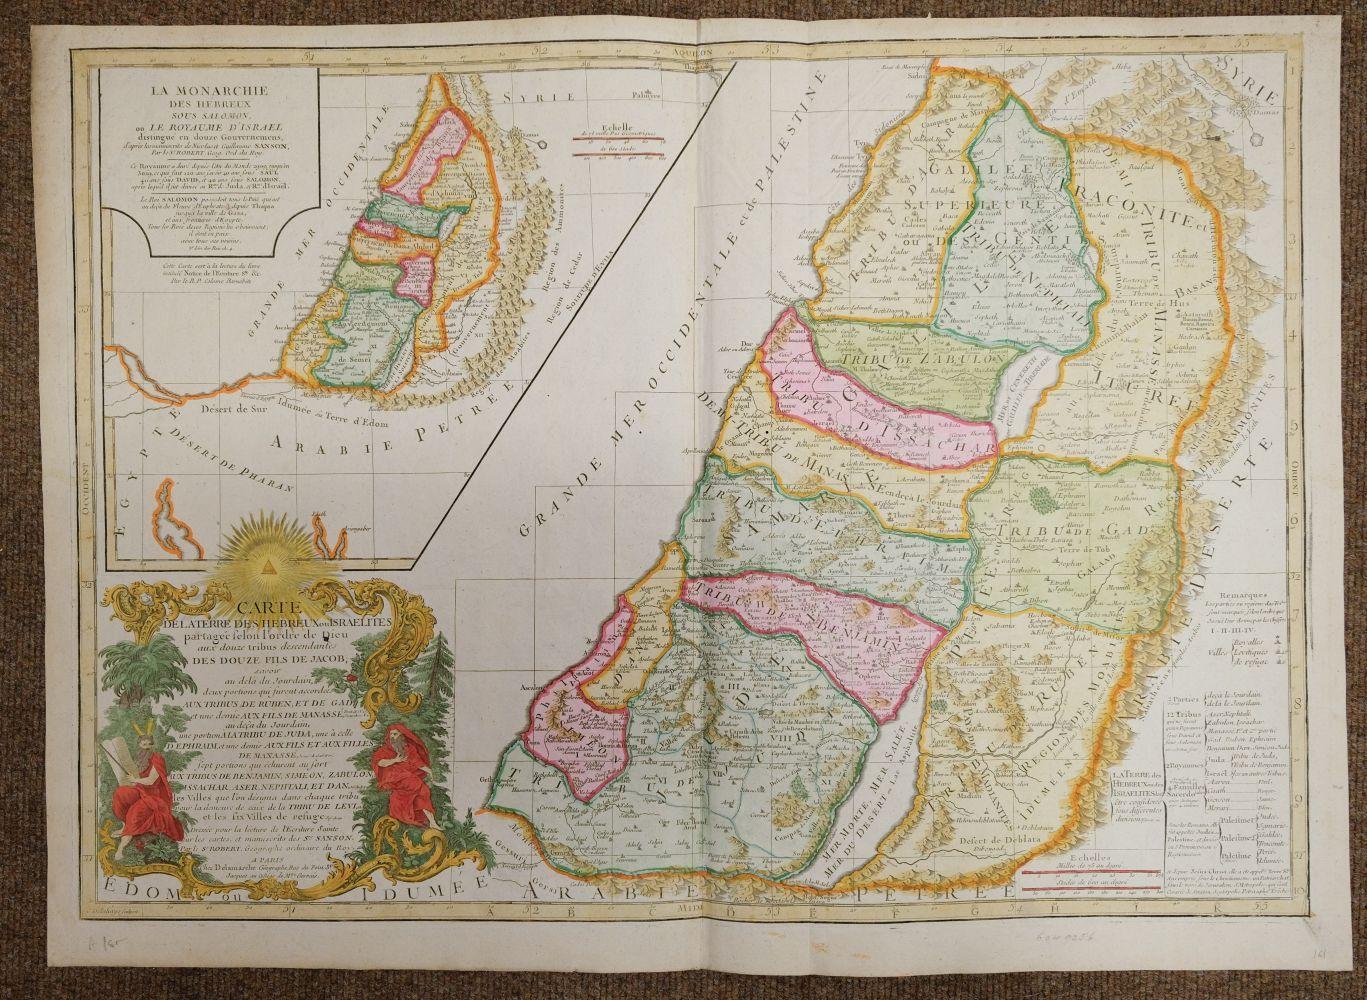 Holy Land. Ottens (R. & J.), Het Beloofde Landt Israels. Terra Sancta..., Amsterdam, circa 1765 - Image 2 of 10